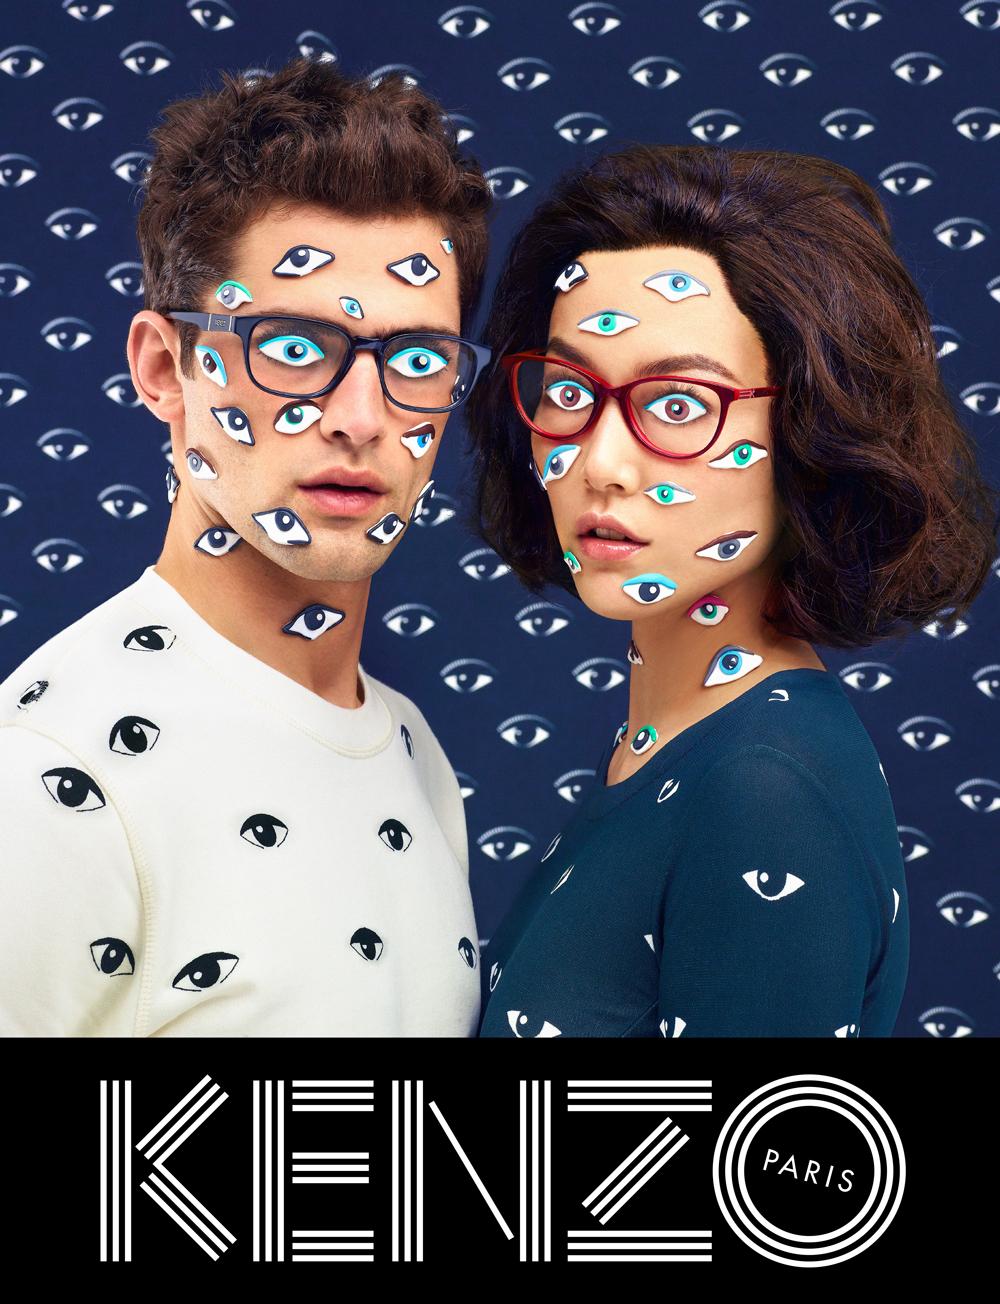 Rinko Kikuchi and Sean O'Pry, Kenzo fall/winter 2013 ad campaign